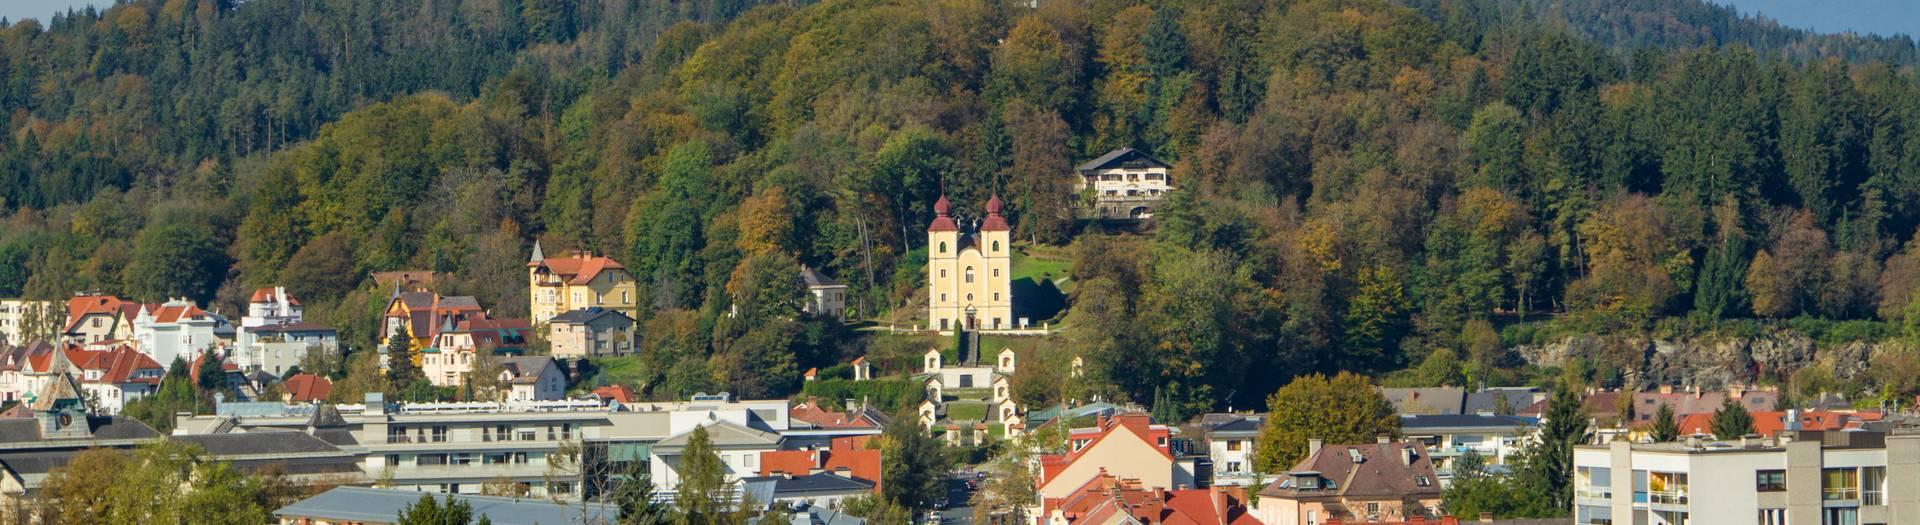 Klagenfurt Kreuzbergl mit Kreuzberglkirche